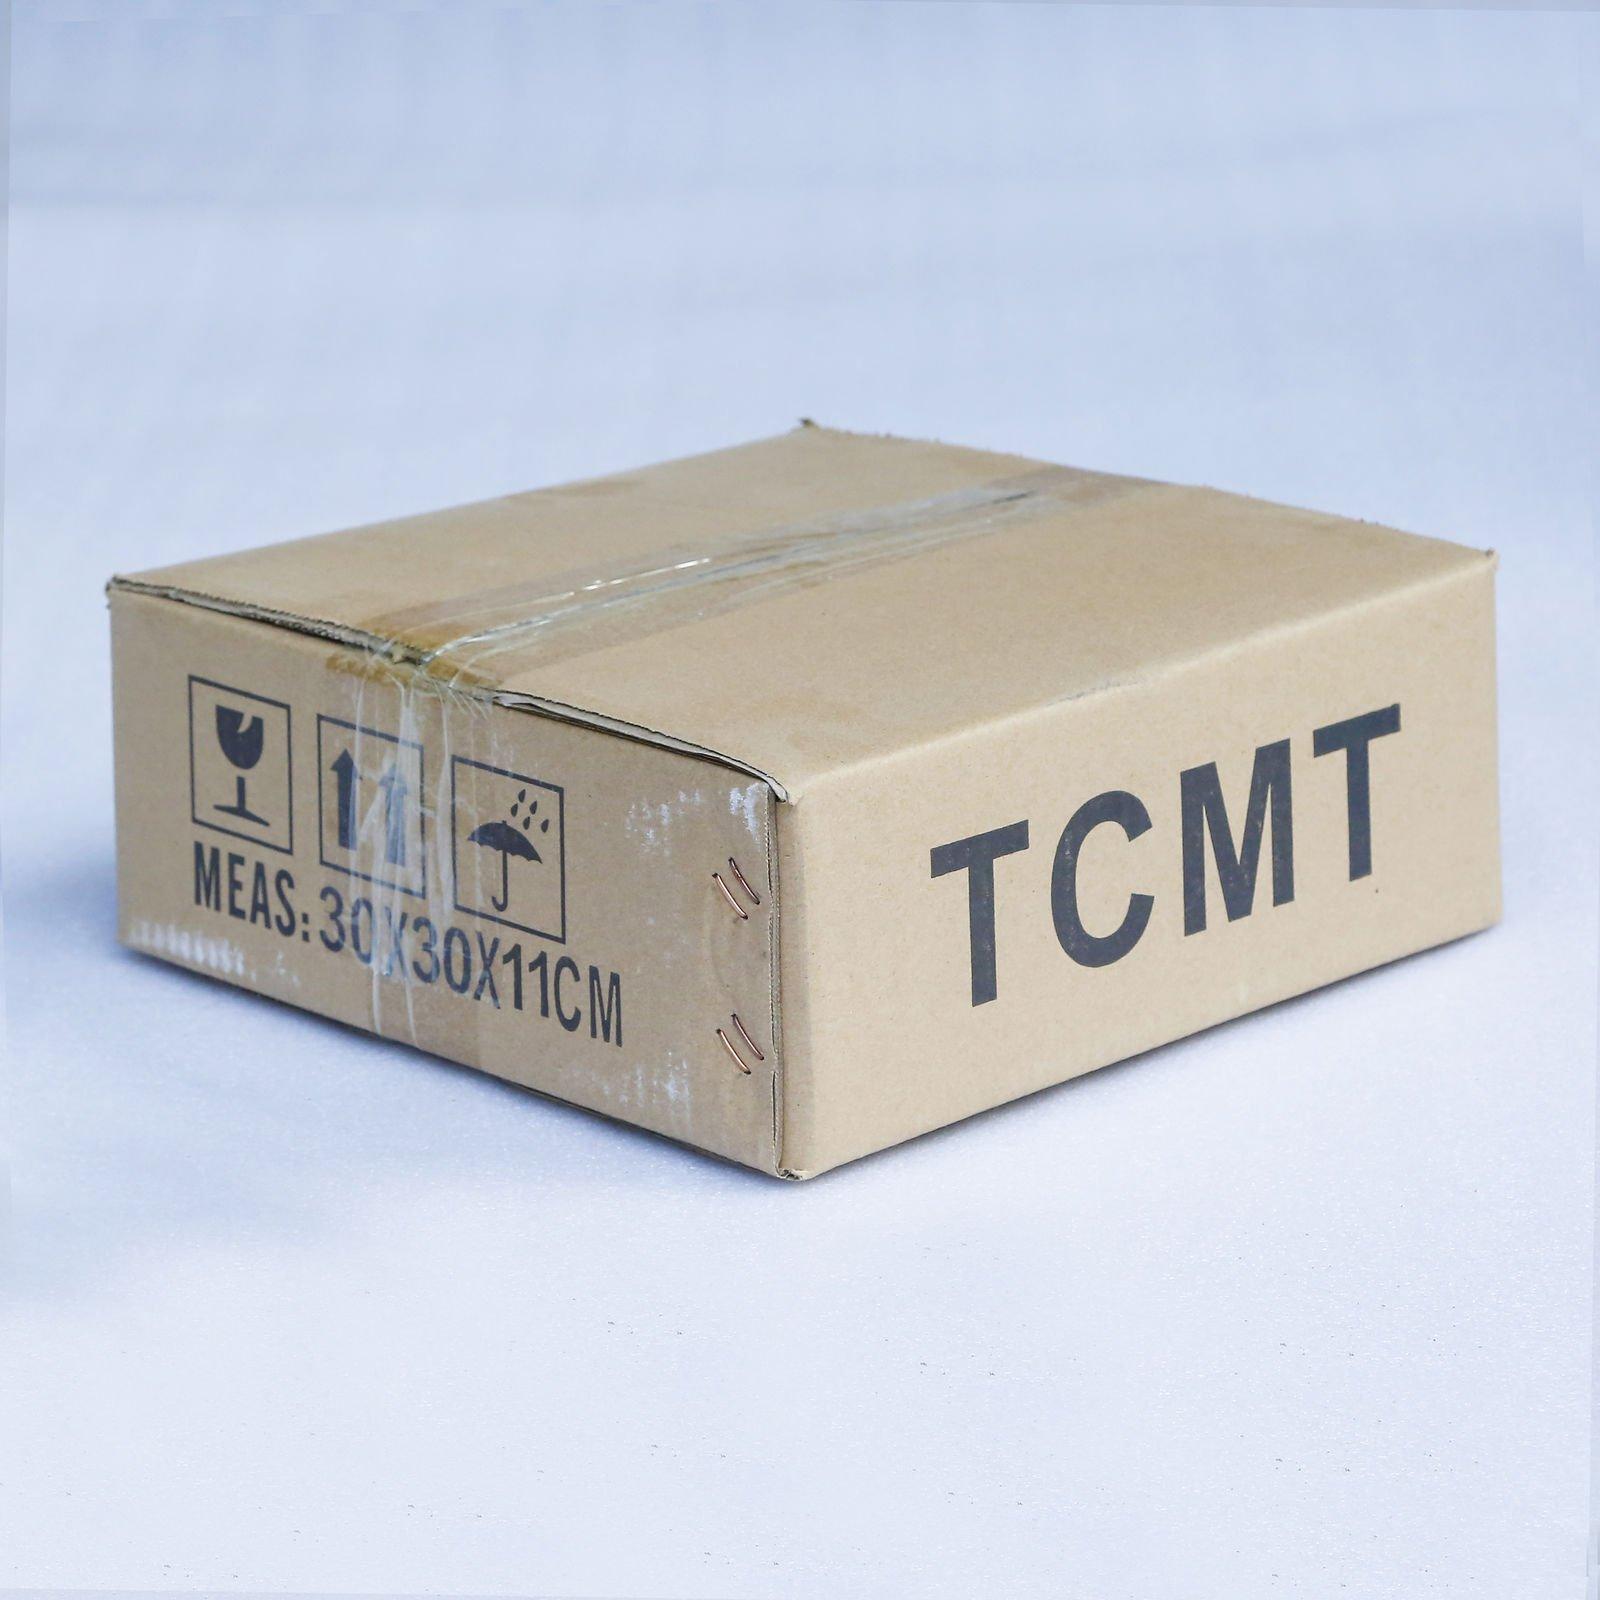 TCMT Engine Guard Highway Crash Bar For Yamaha XVS650 Dragstar 400 650 1997 1998 1999 2000 01 02 03 04 05 2006 2007 2008 2009 2010 2011 2012